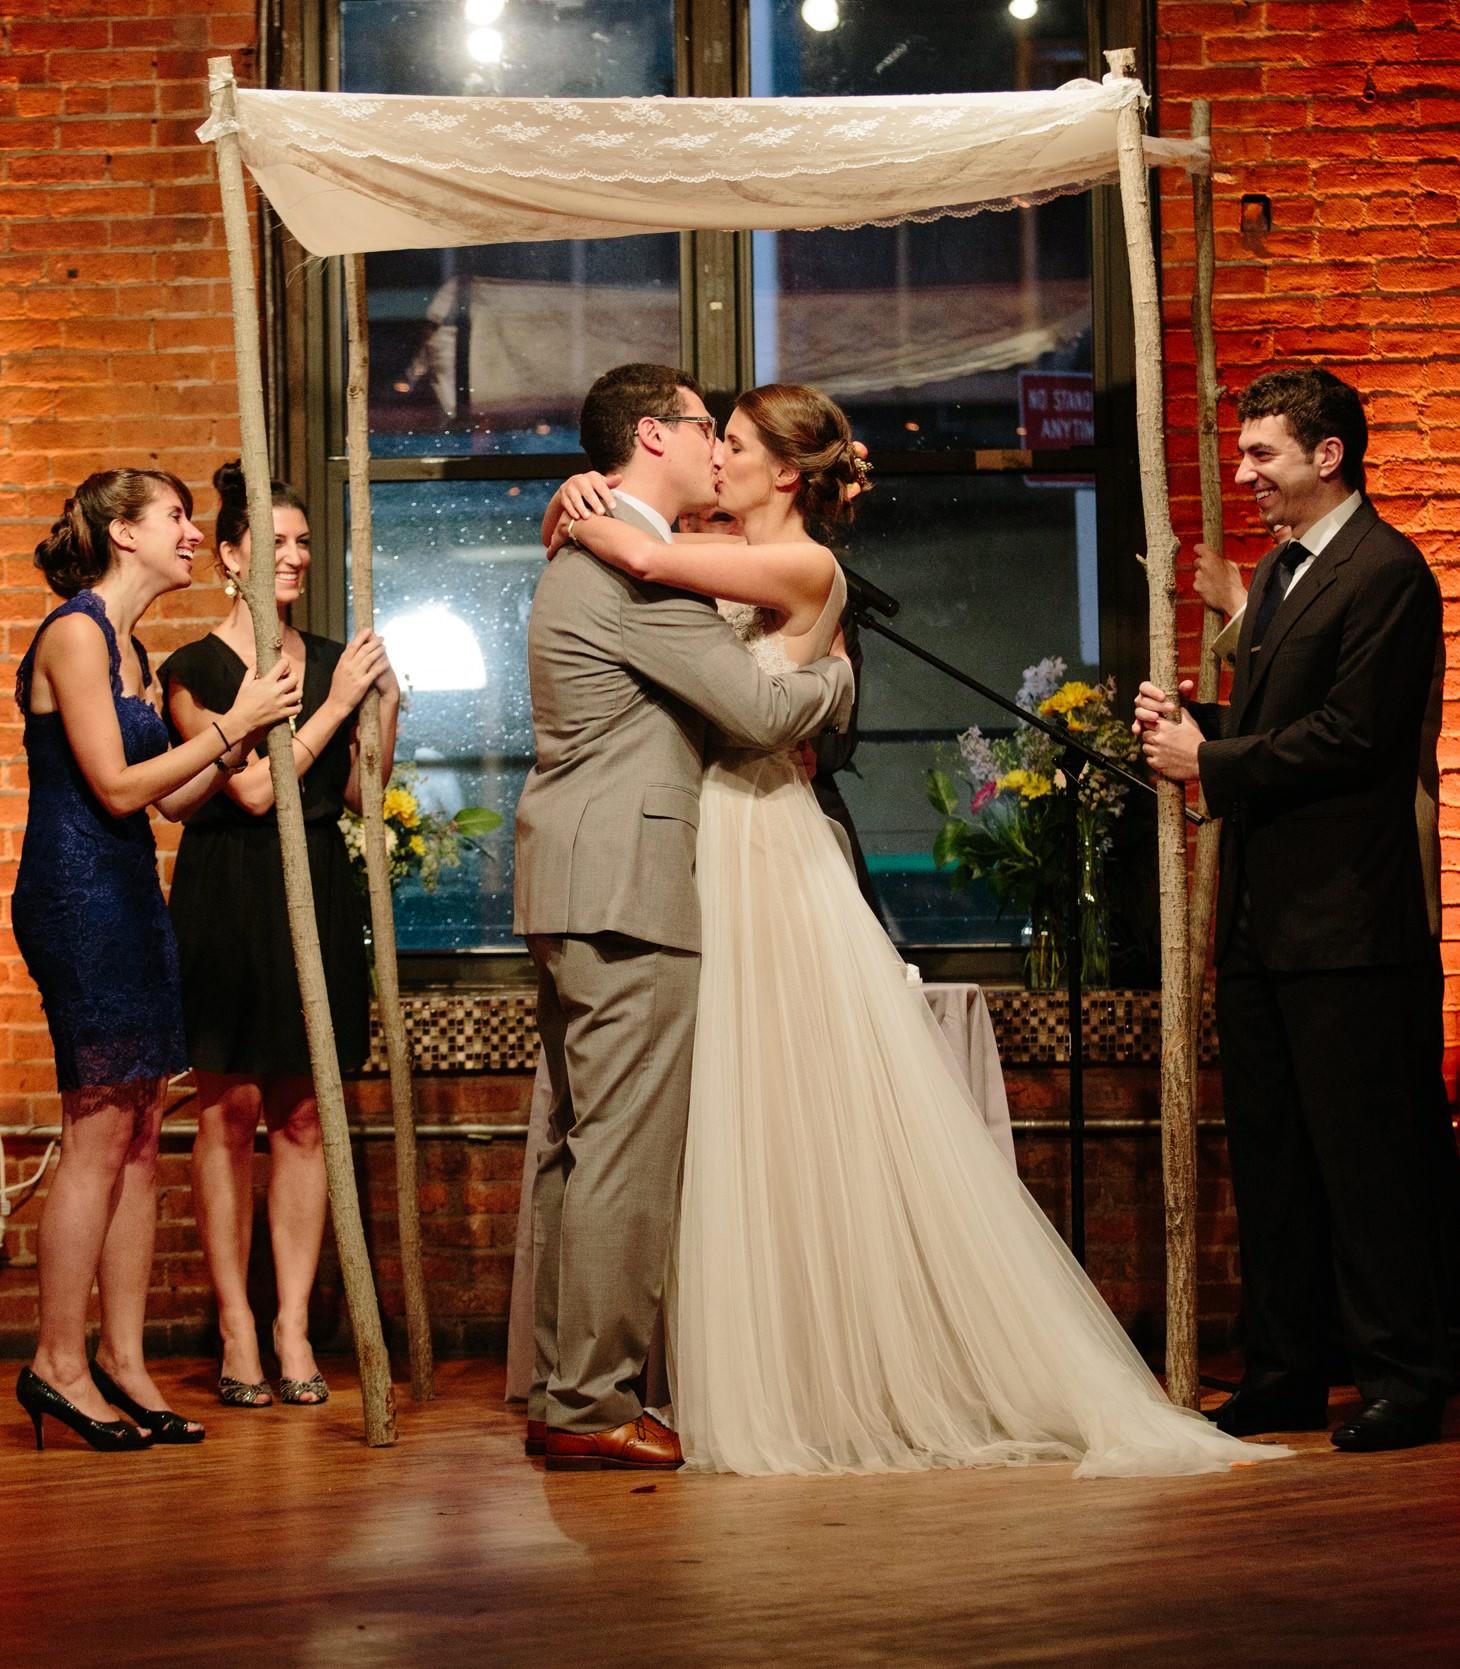 030-nyc-dumbo-loft-brooklyn-wedding-photographer-smitten-chickens-photo-.jpg